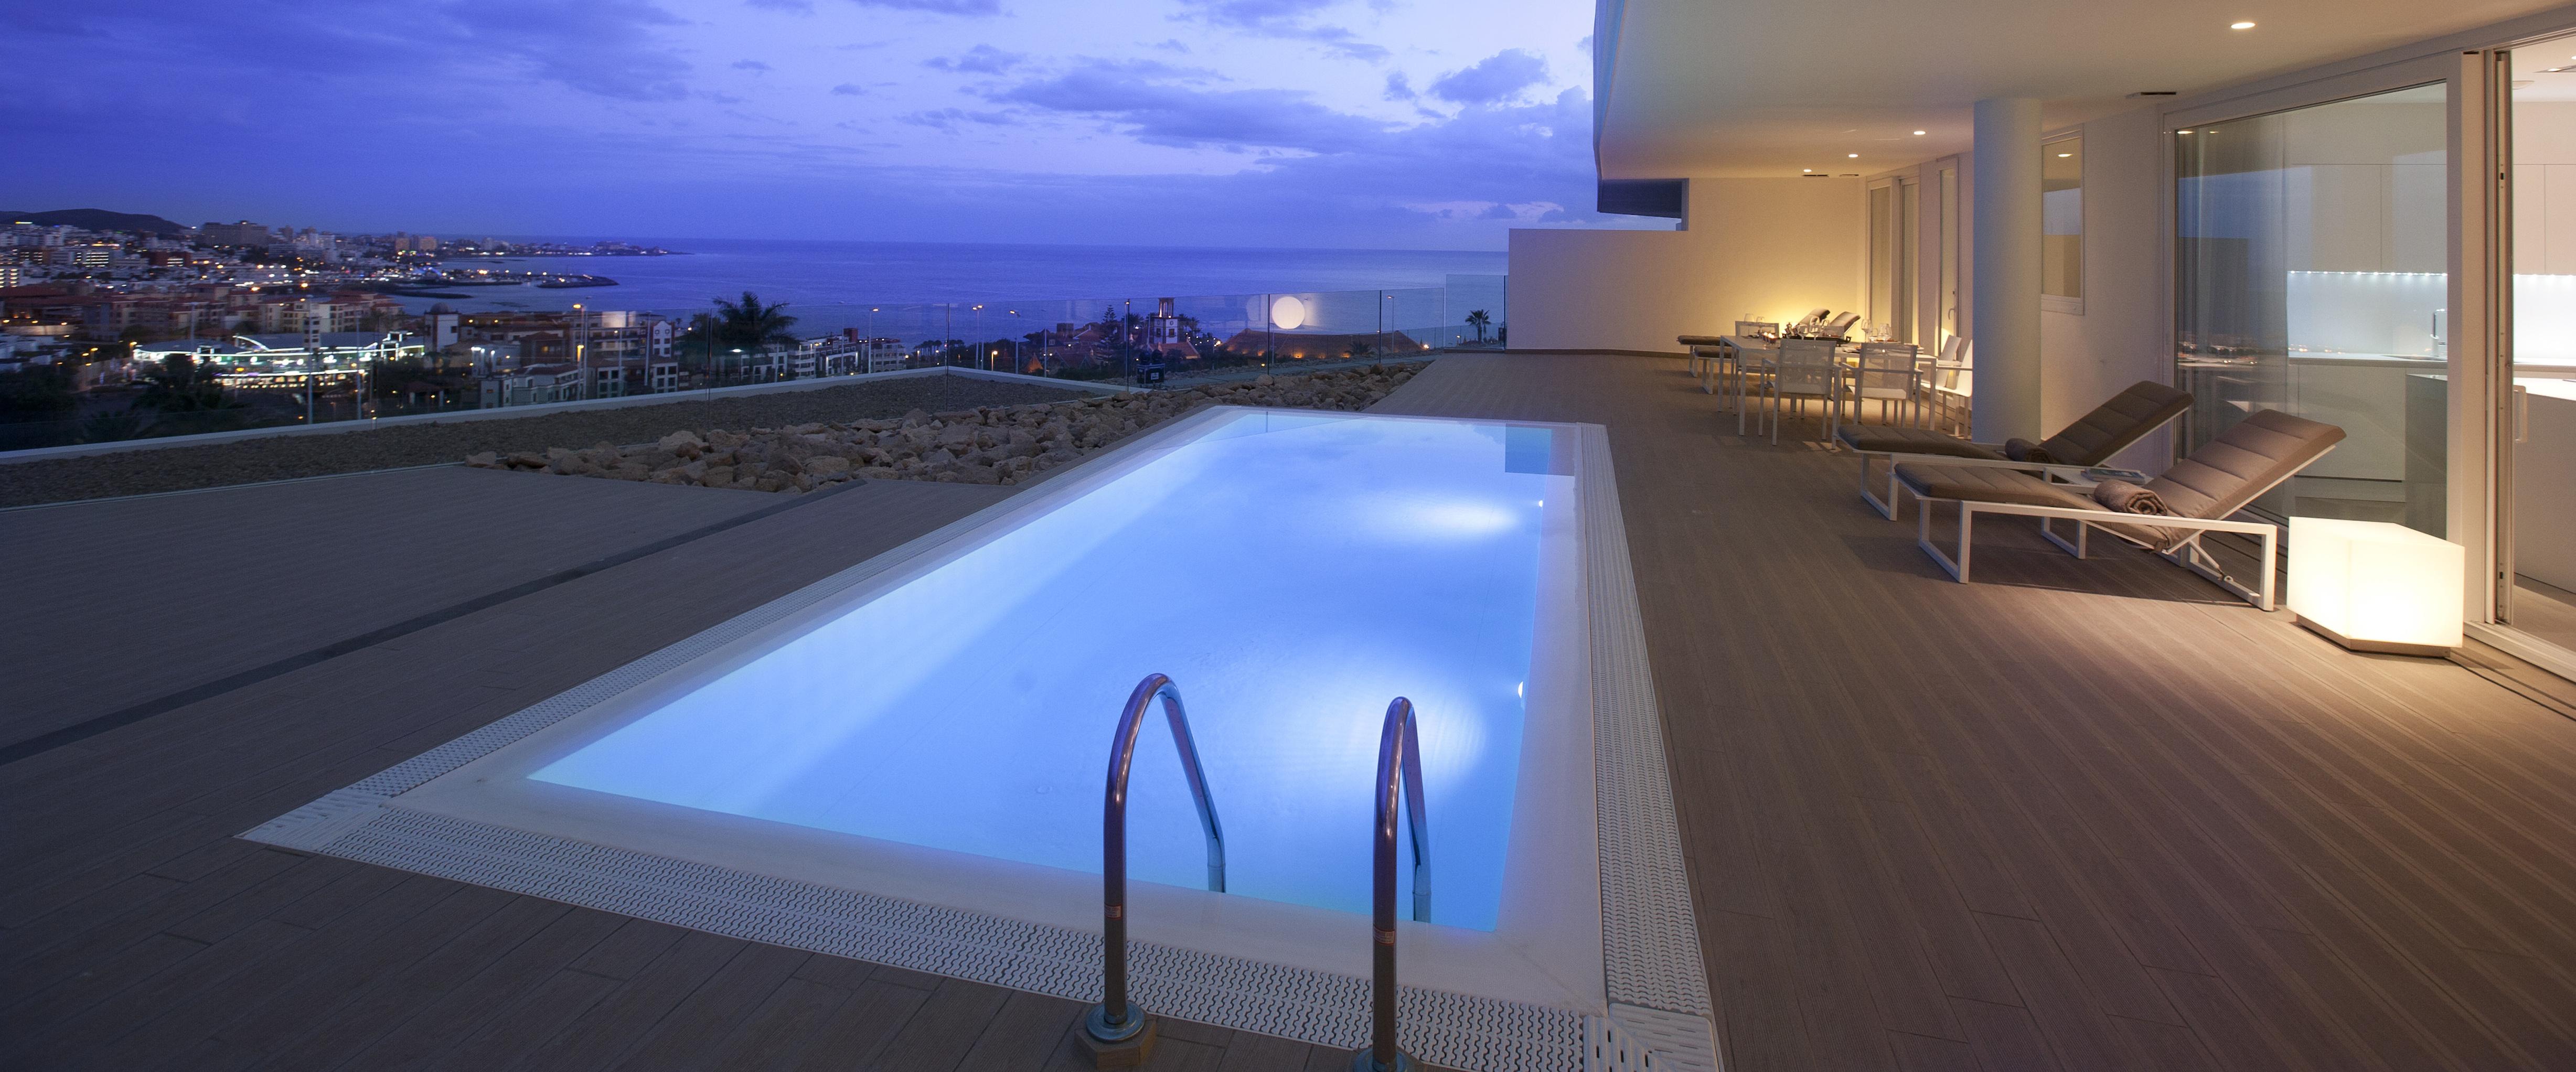 luxury-suite-baobab-suites-tenerife